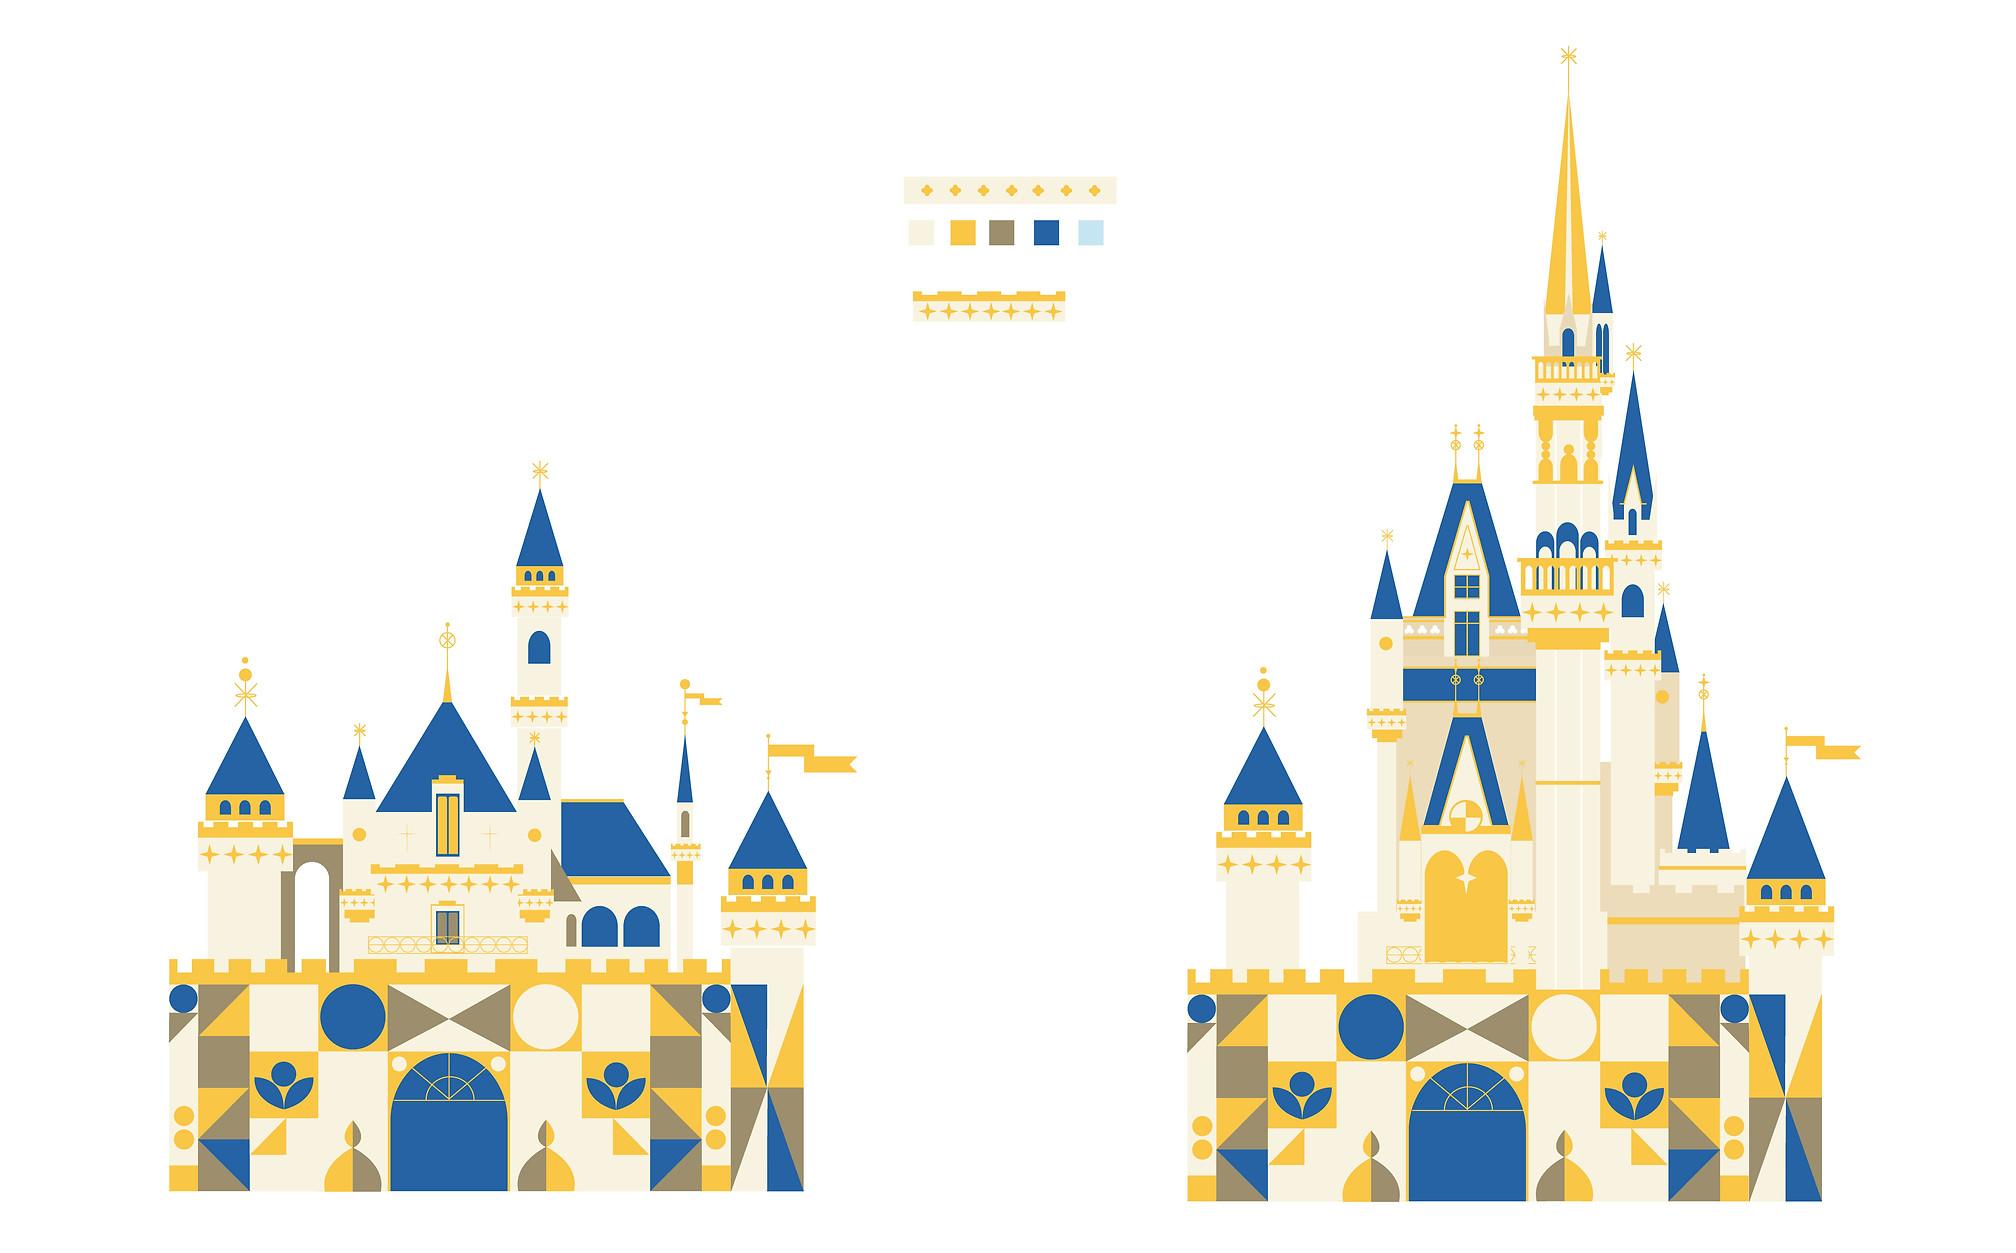 DisneyHoliday_CinderallaCastle_v01.jpg